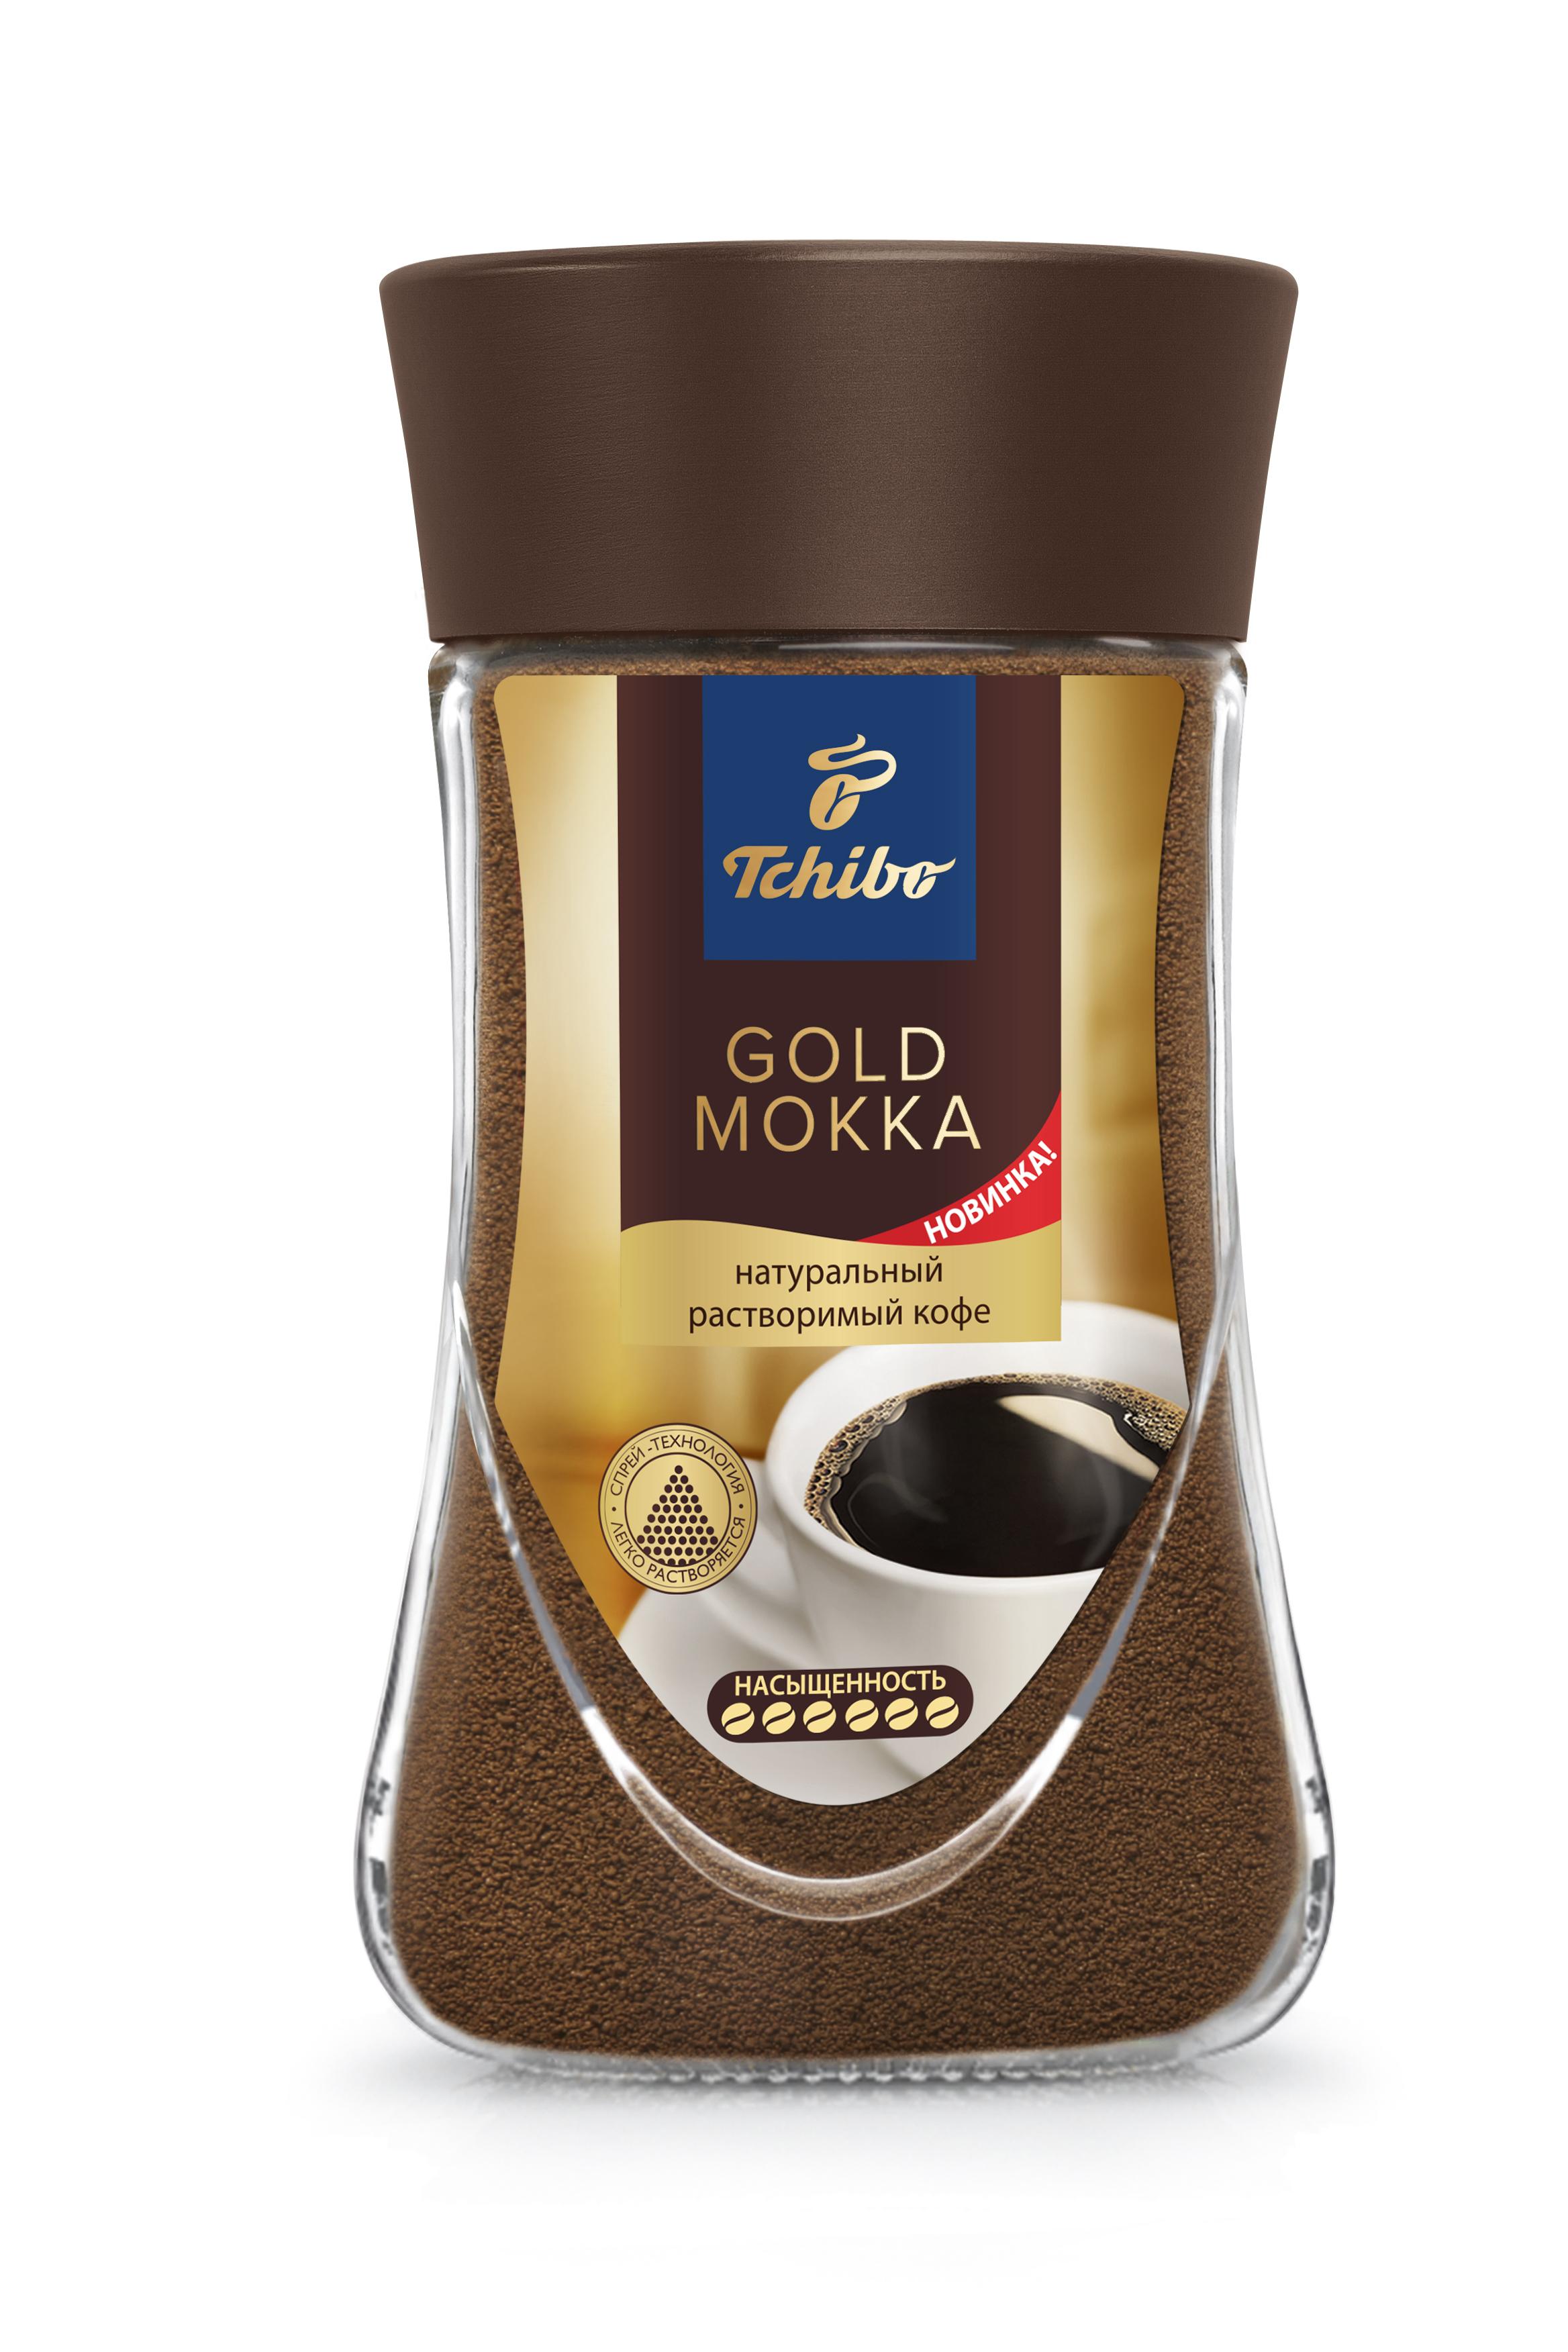 Tchibo Gold Mokka кофе растворимый, 95 г lavazza prontissimo classico кофе растворимый 95 г